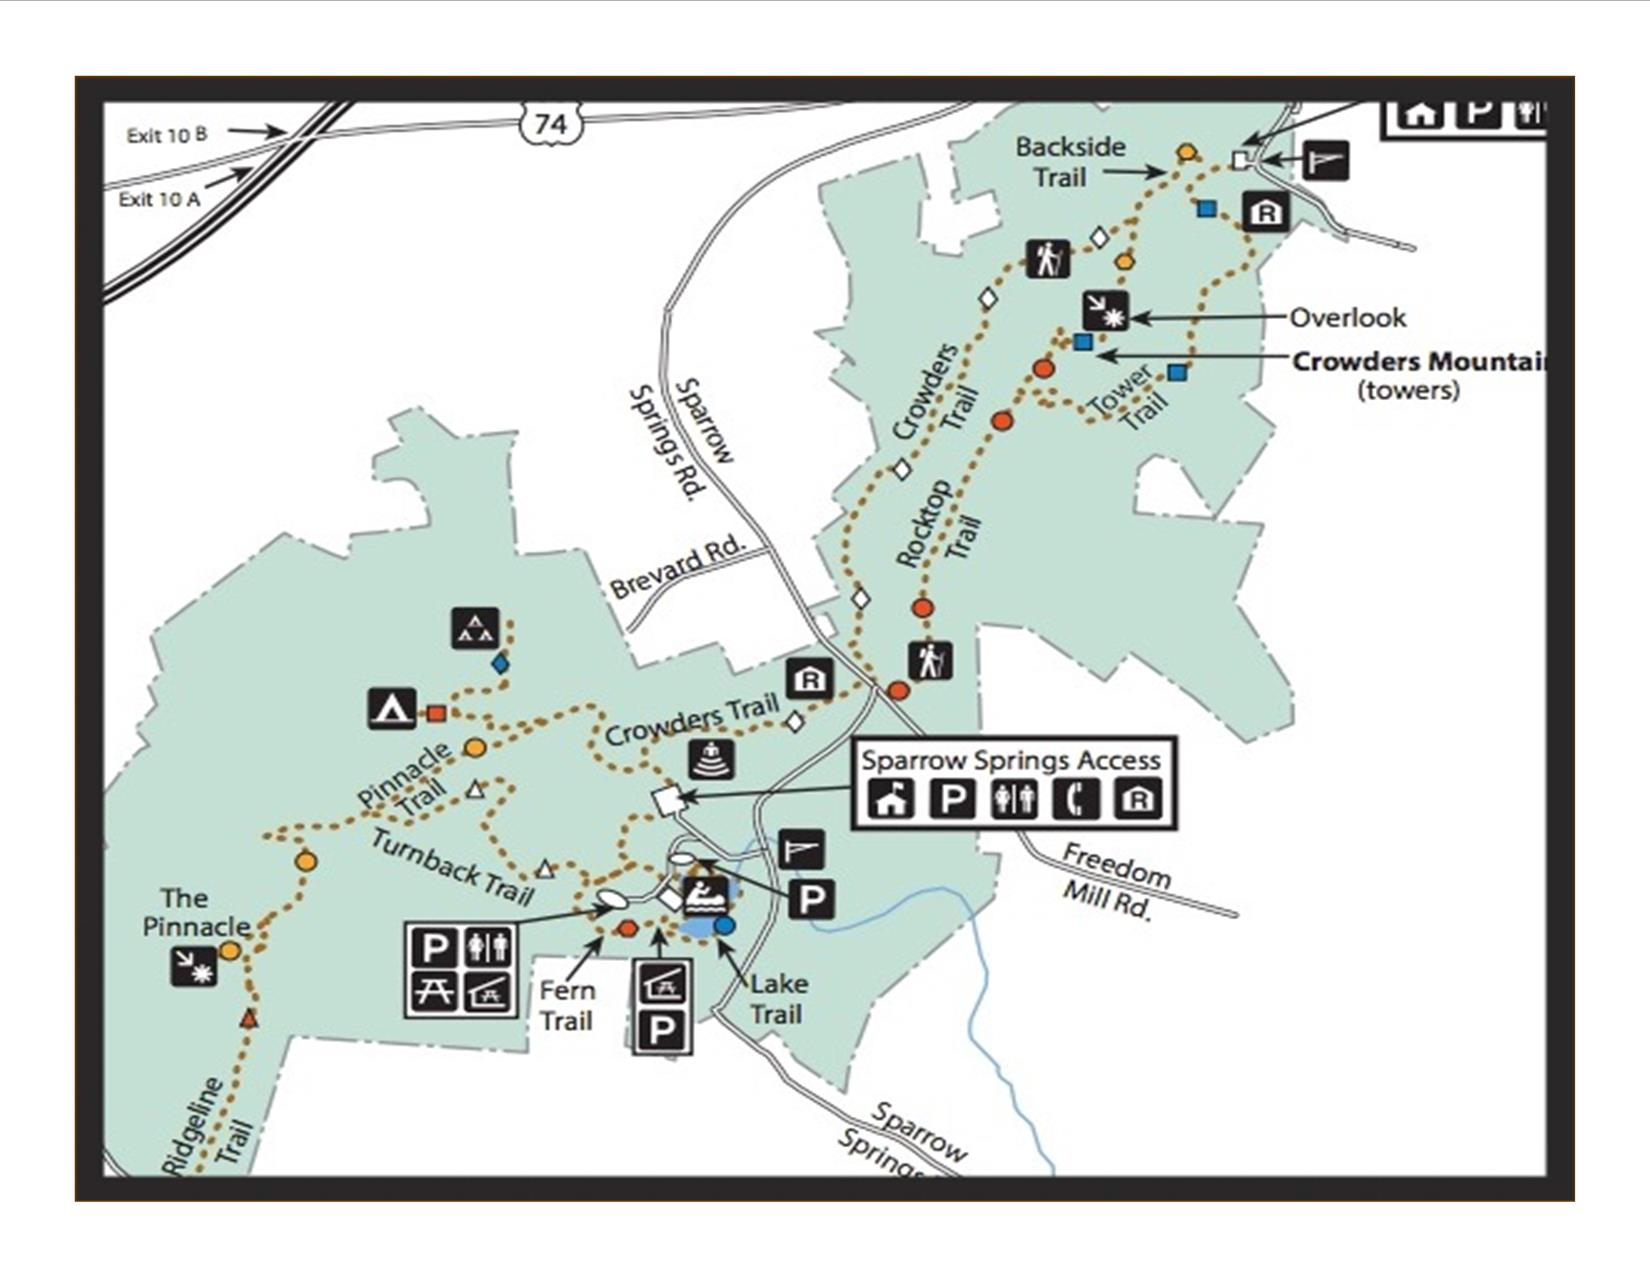 MAP OF CROWDERS TRAILS